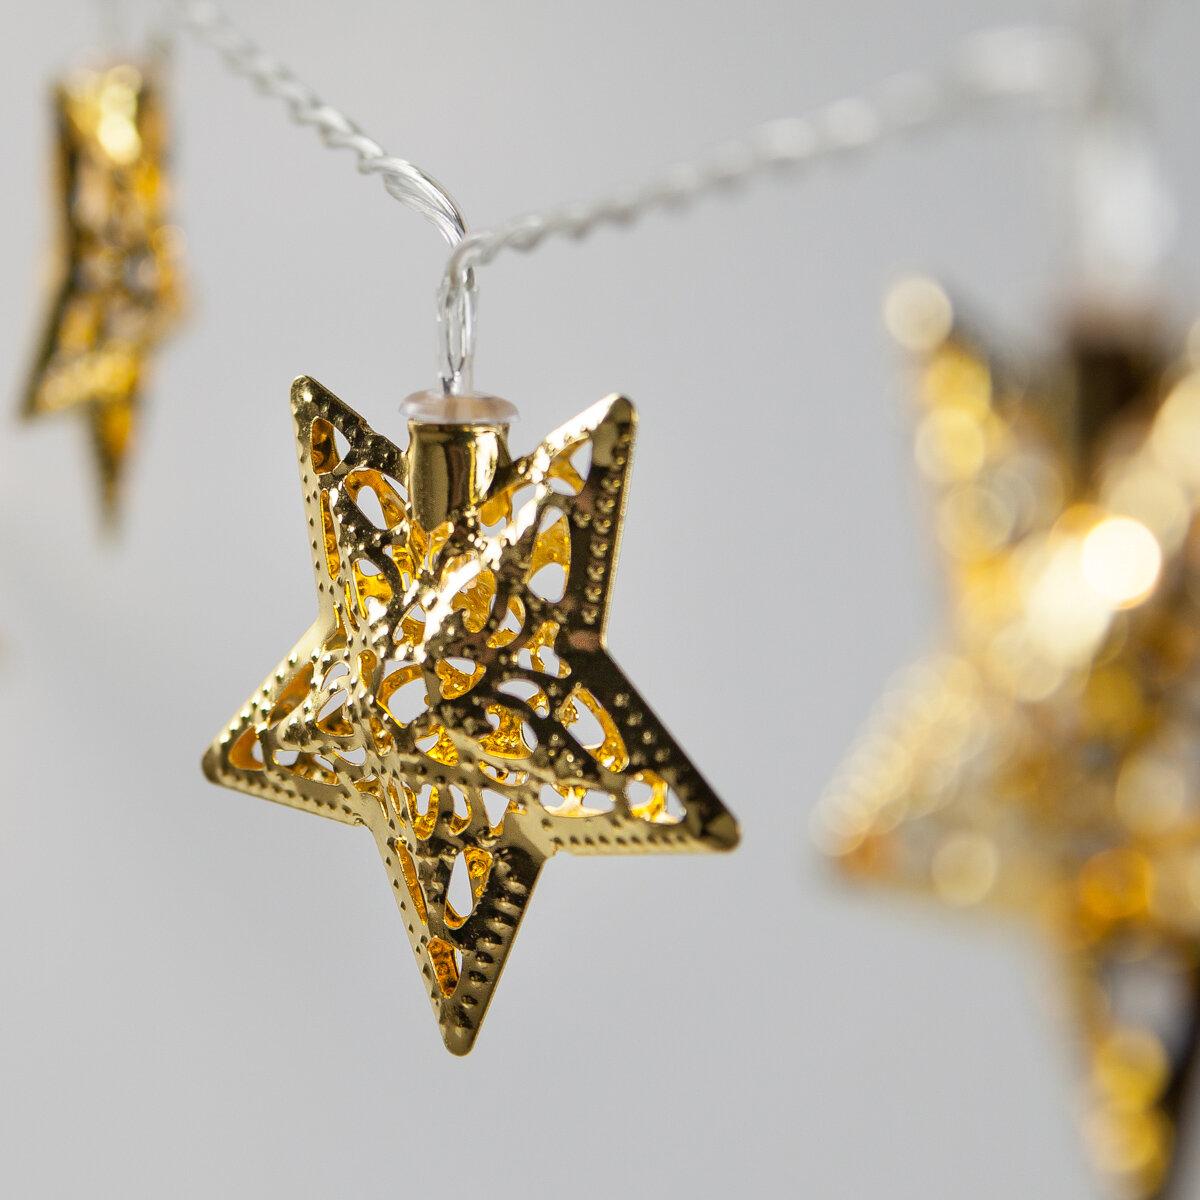 The Holiday Aisle Metal Star Led 10 Light Battery String Light Reviews Wayfair